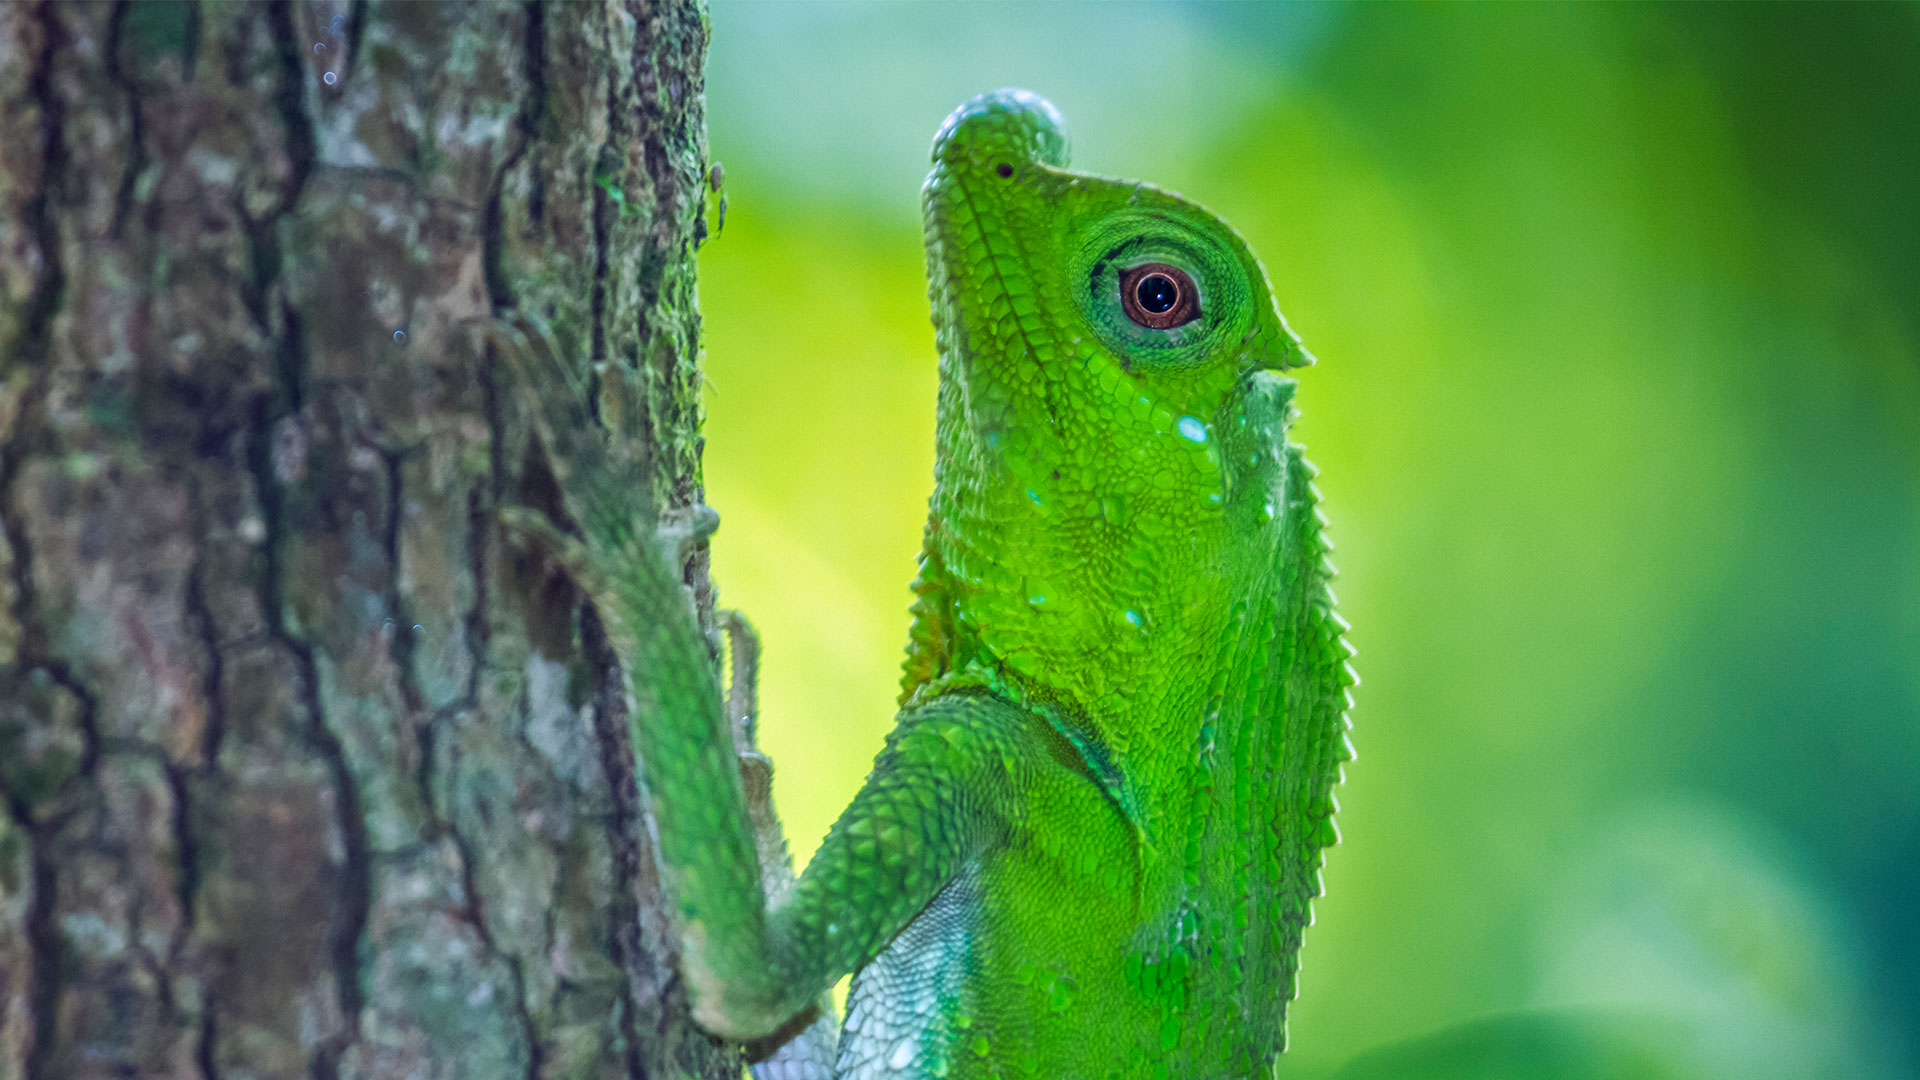 Hump-nosed-Lizard-in-Sinharaja-forest-reserve,-Sri-Lanka